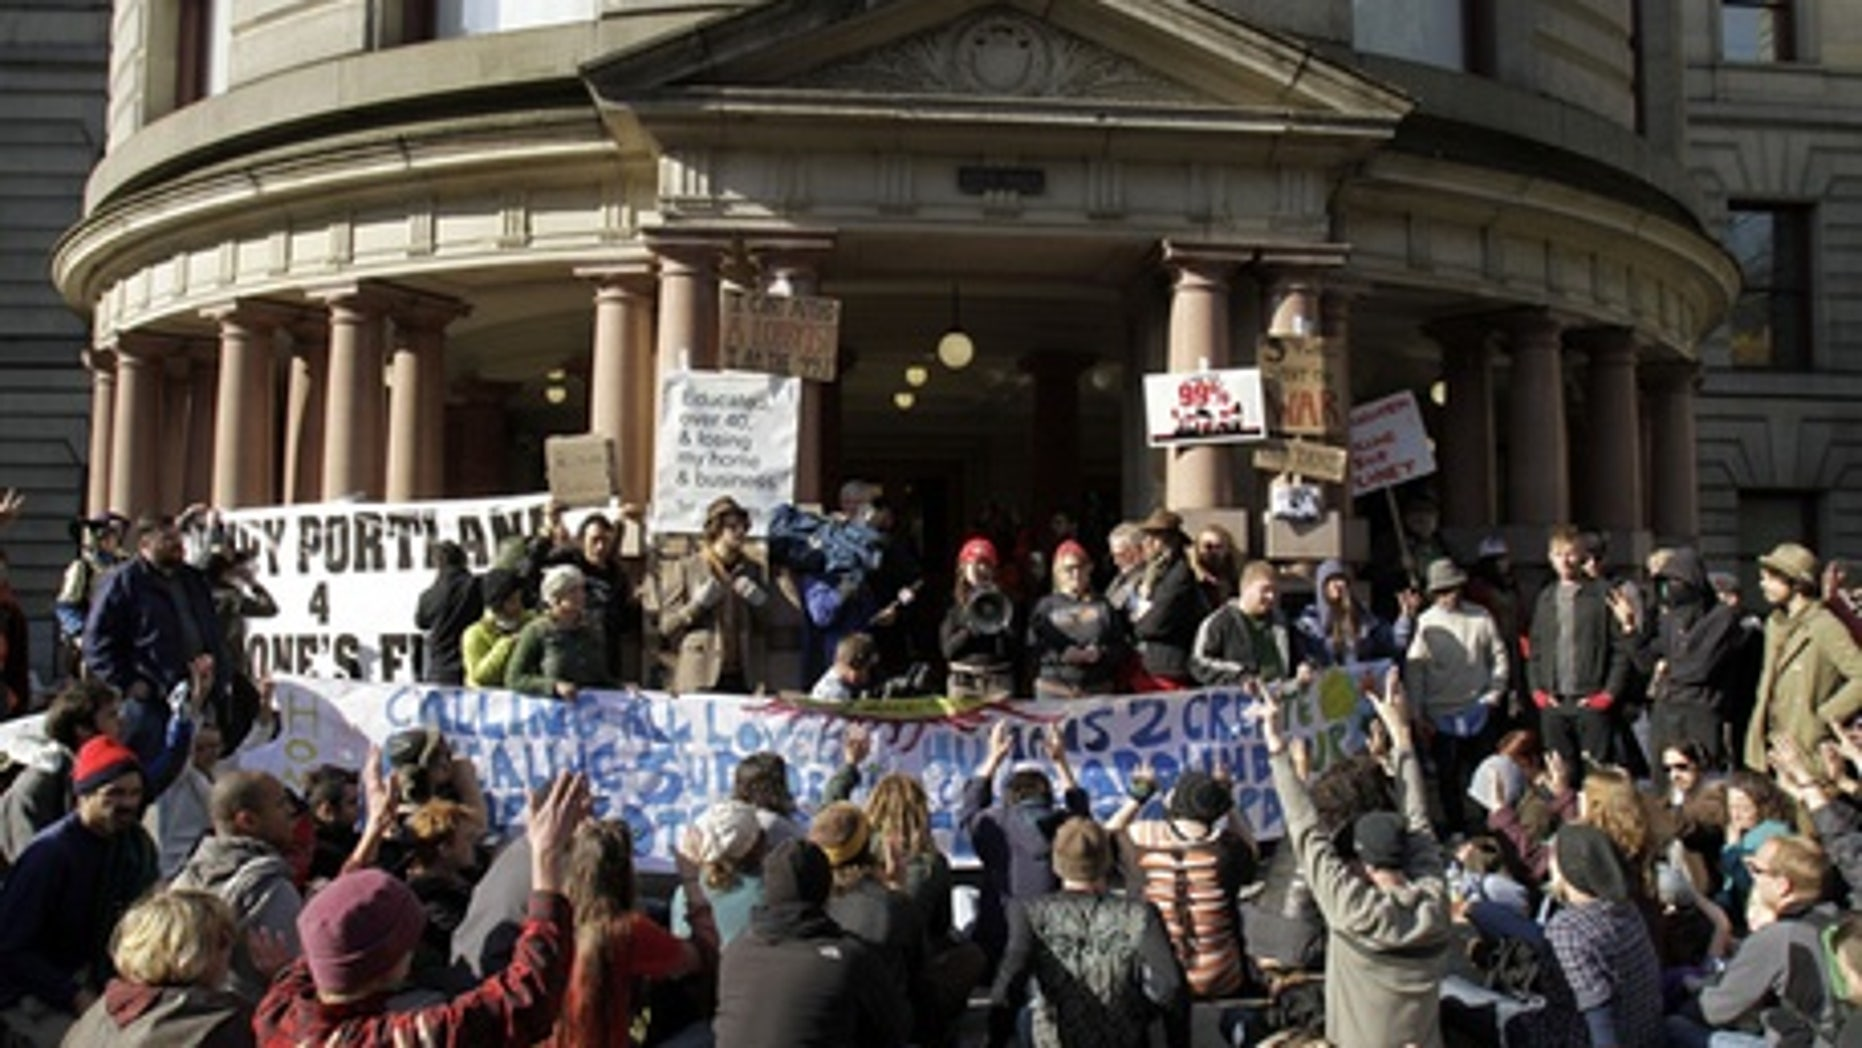 November 2011: Occupy Portland protesters gather outside City Hall.